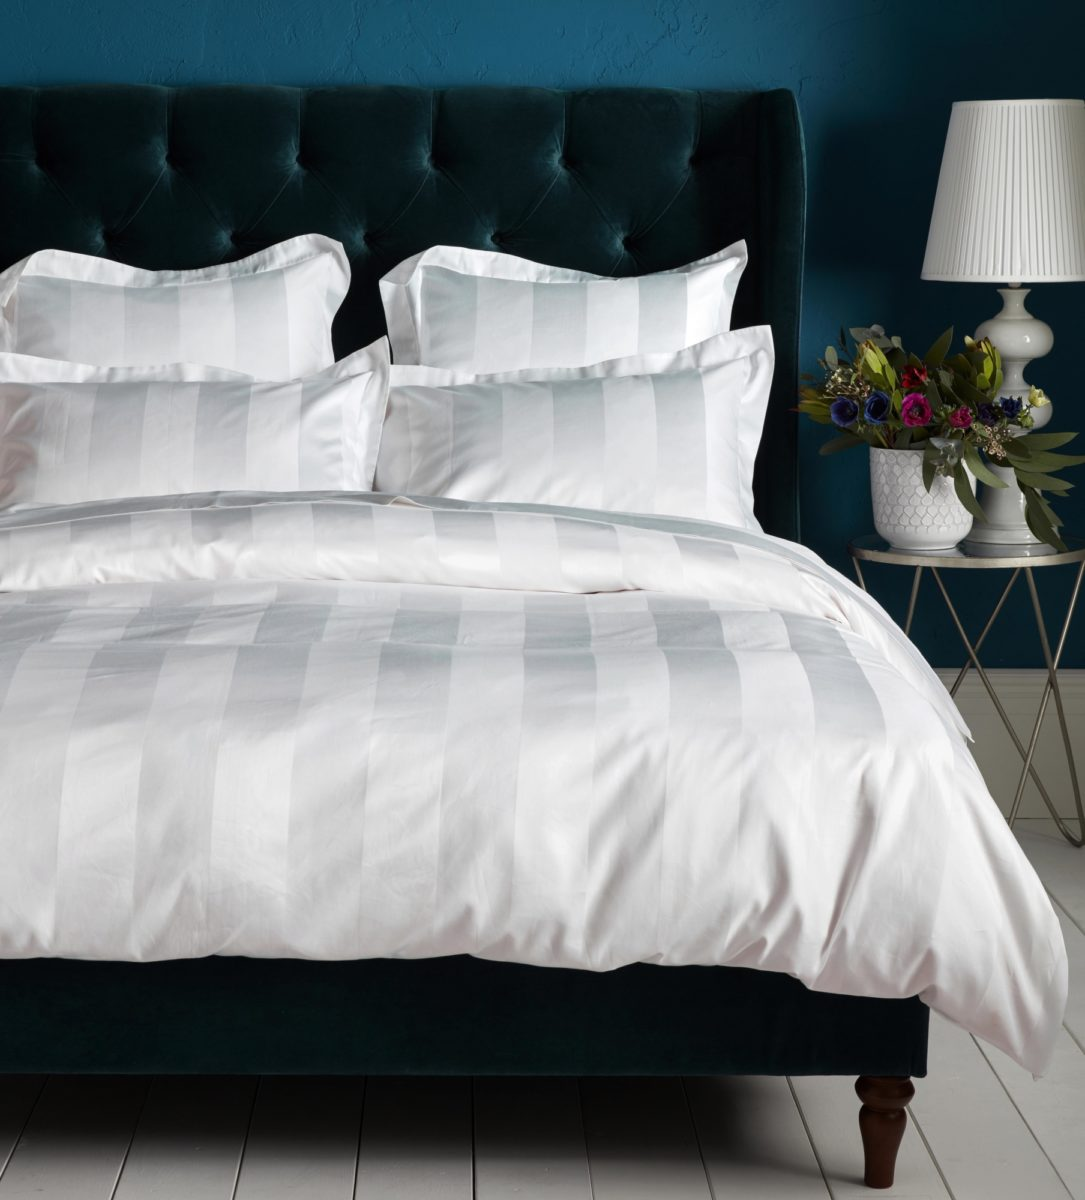 600 Thread Count Luxury White Striped Bedding | Secret Linen Store